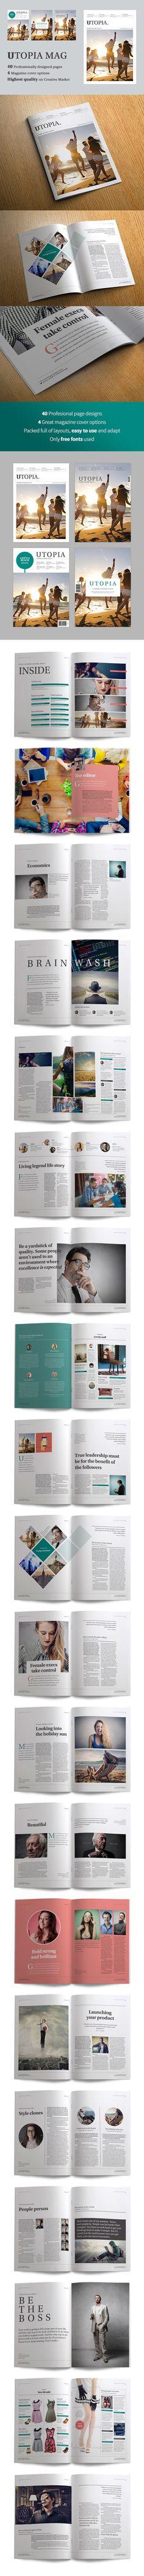 Utopia magazine by CRS Design on @graphicsmag